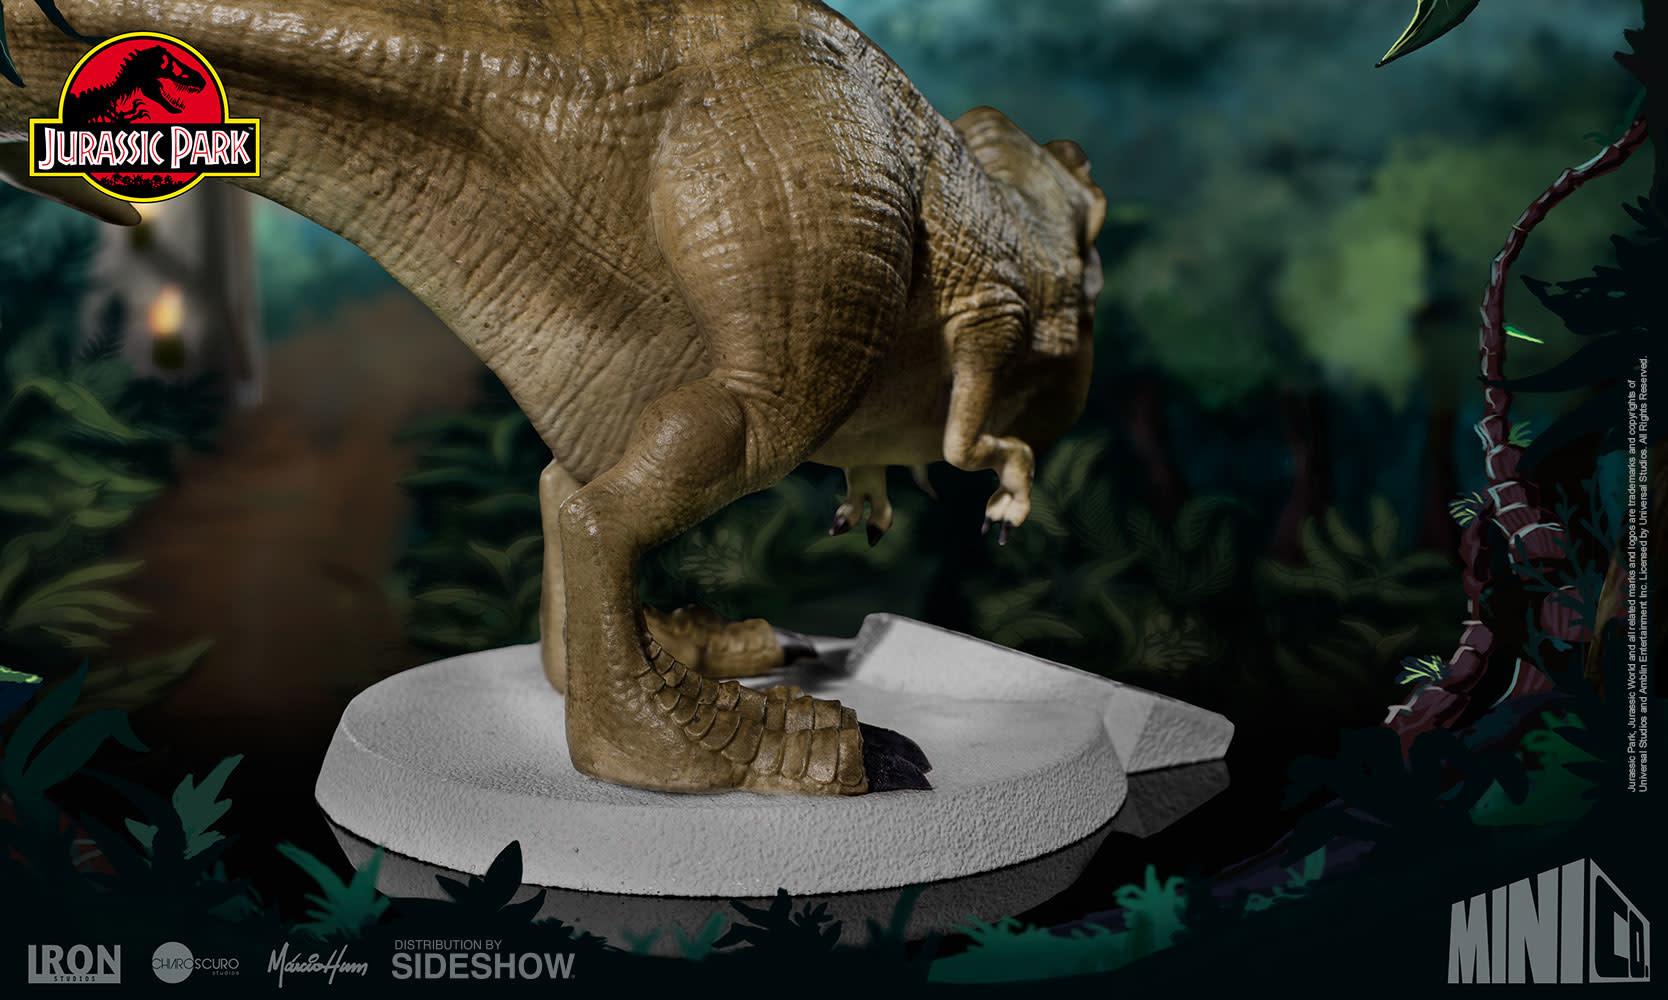 Sideshow Jurassic Park: Tyrannosaurus Rex Mini Co. Figure